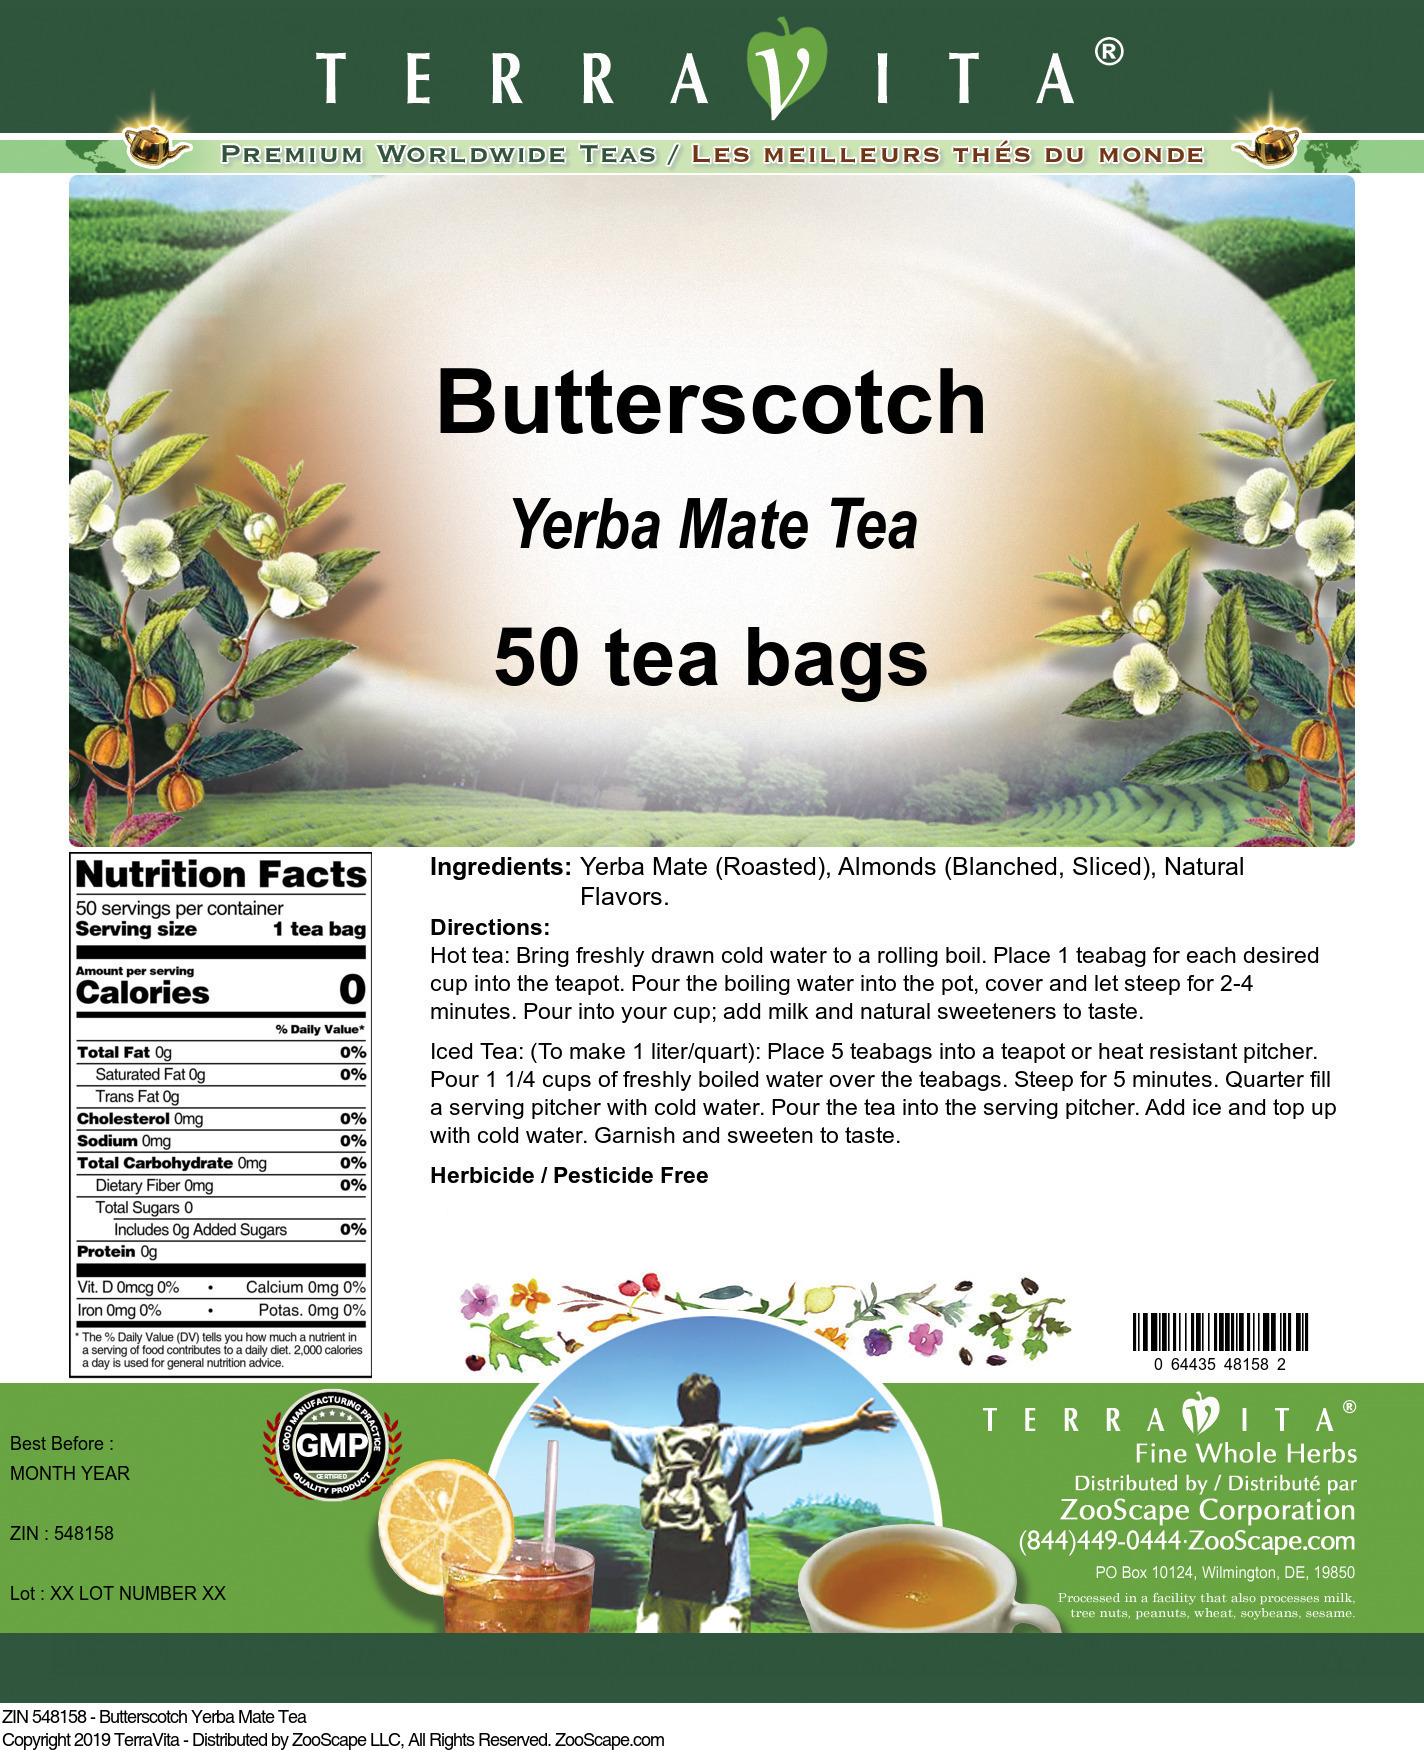 Butterscotch Yerba Mate Tea